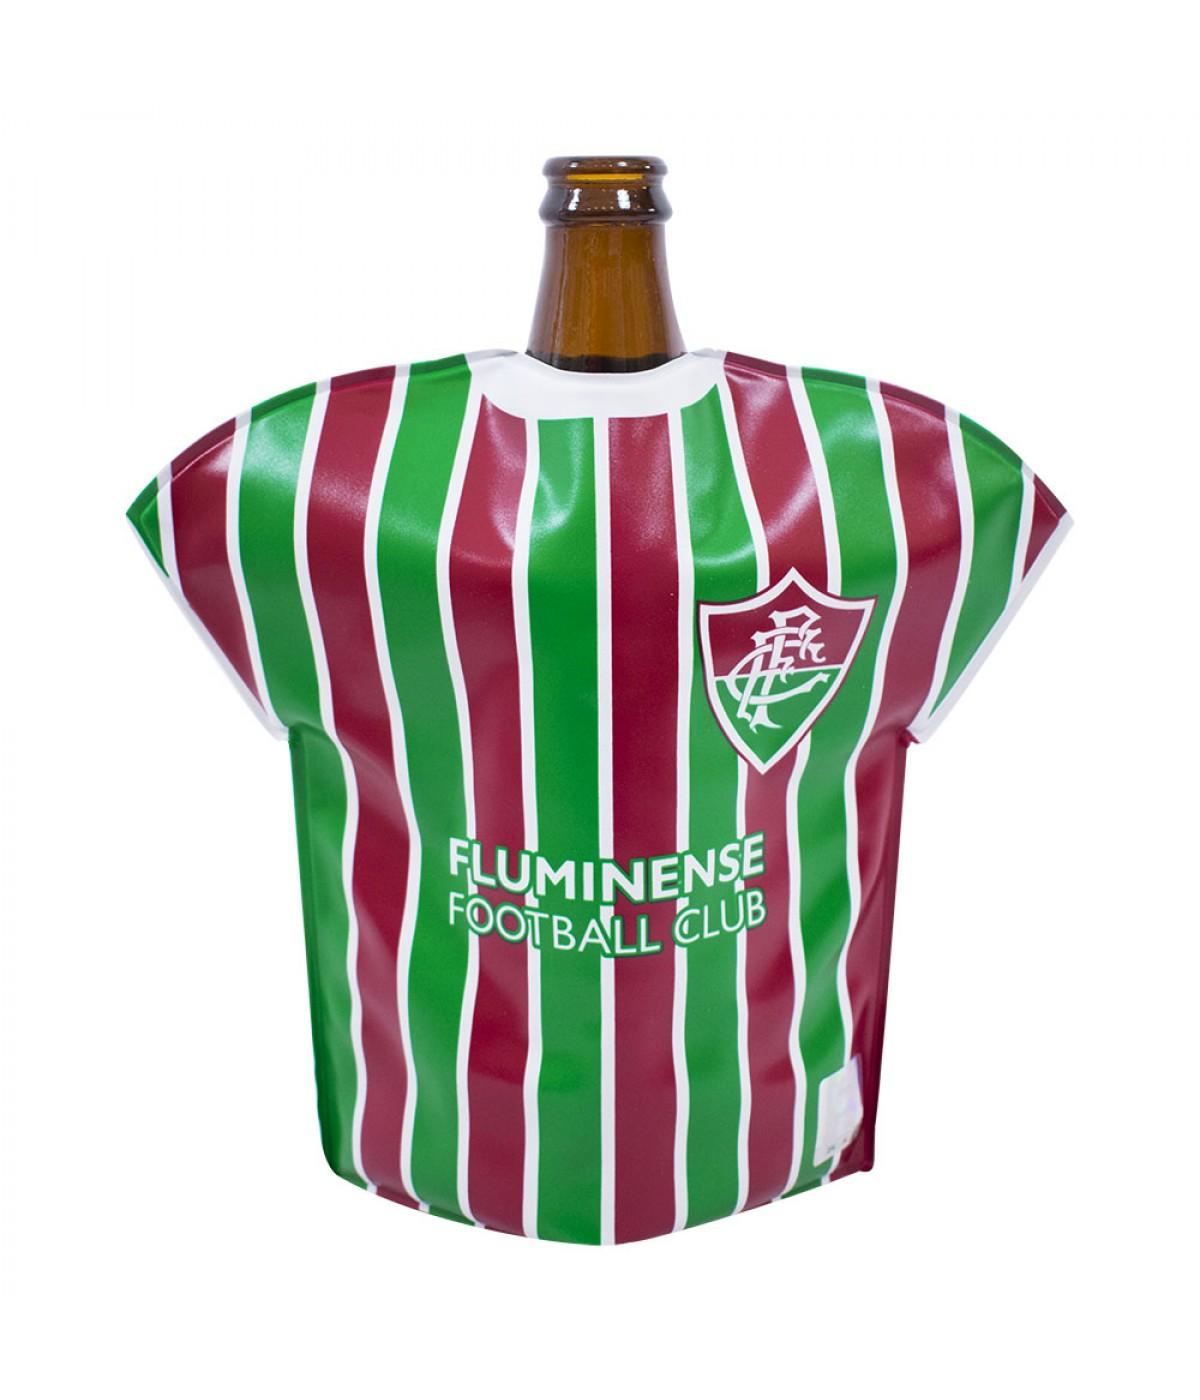 Bolsa Térmica Em Forma De Camisa - Fluminense 215e4ac7d6ceb